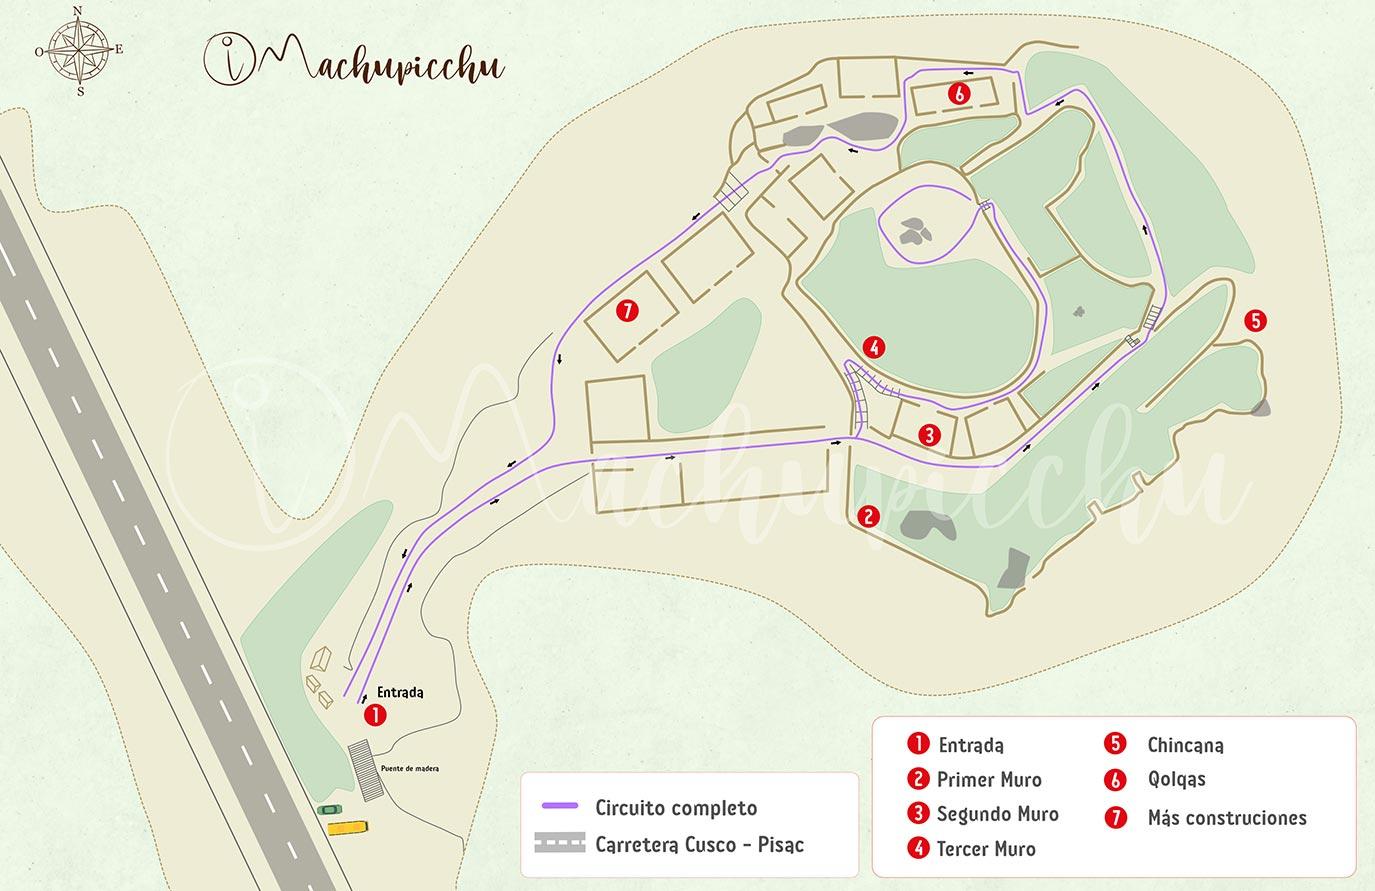 Mapa de recorrido sitio arqueológico de Puca Pucára